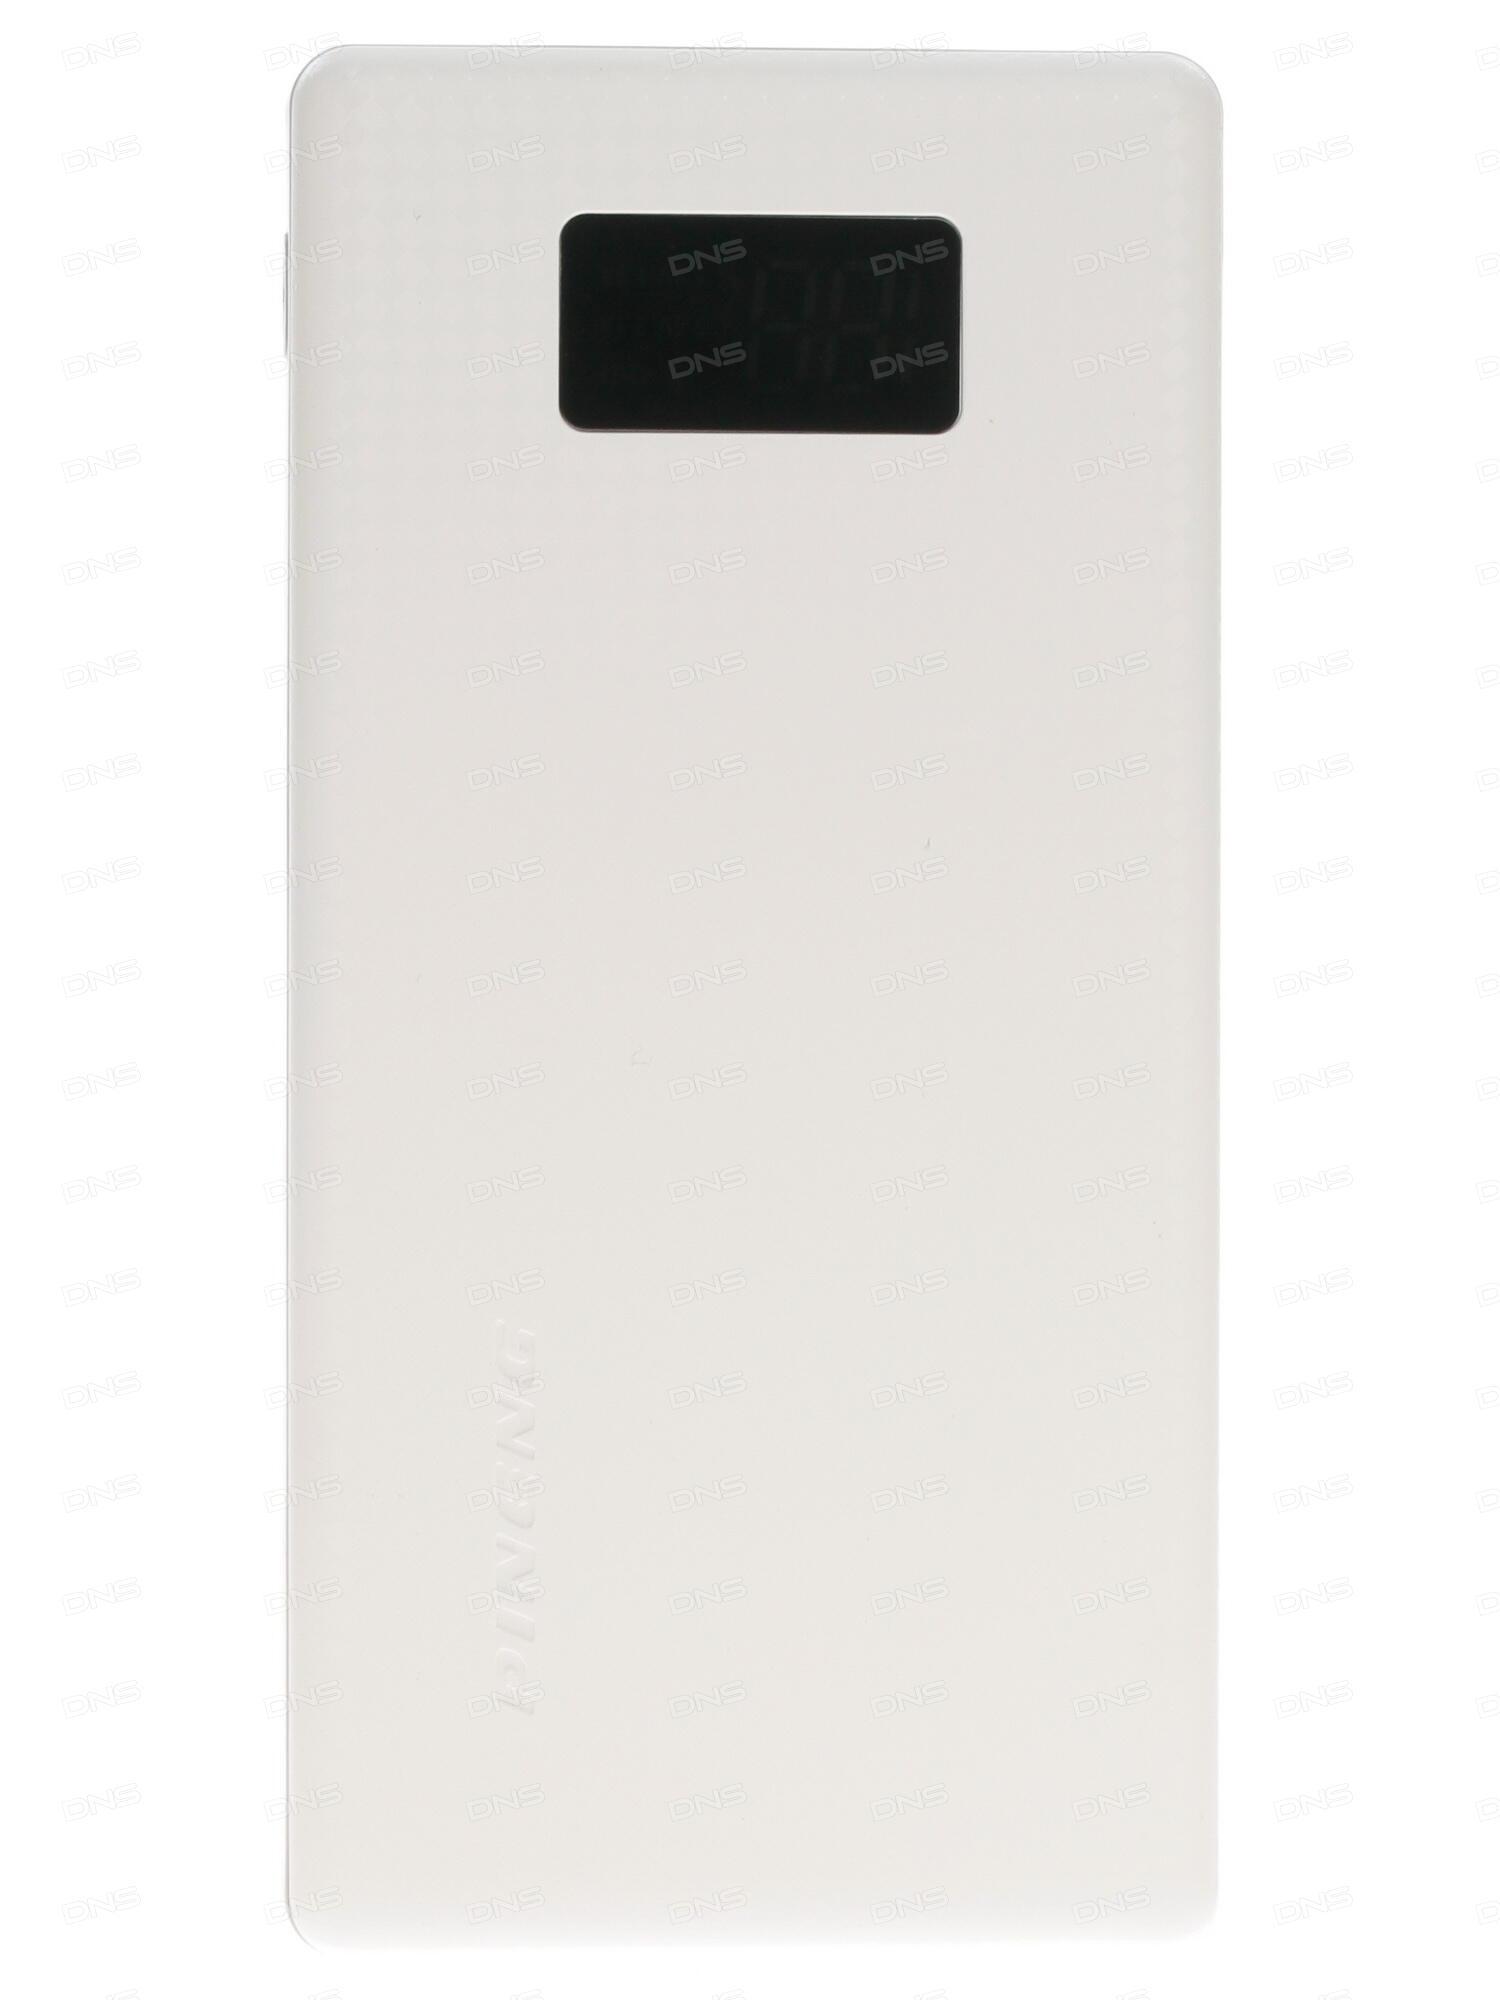 Аккумулятор Pineng PN-963 10000mAh White